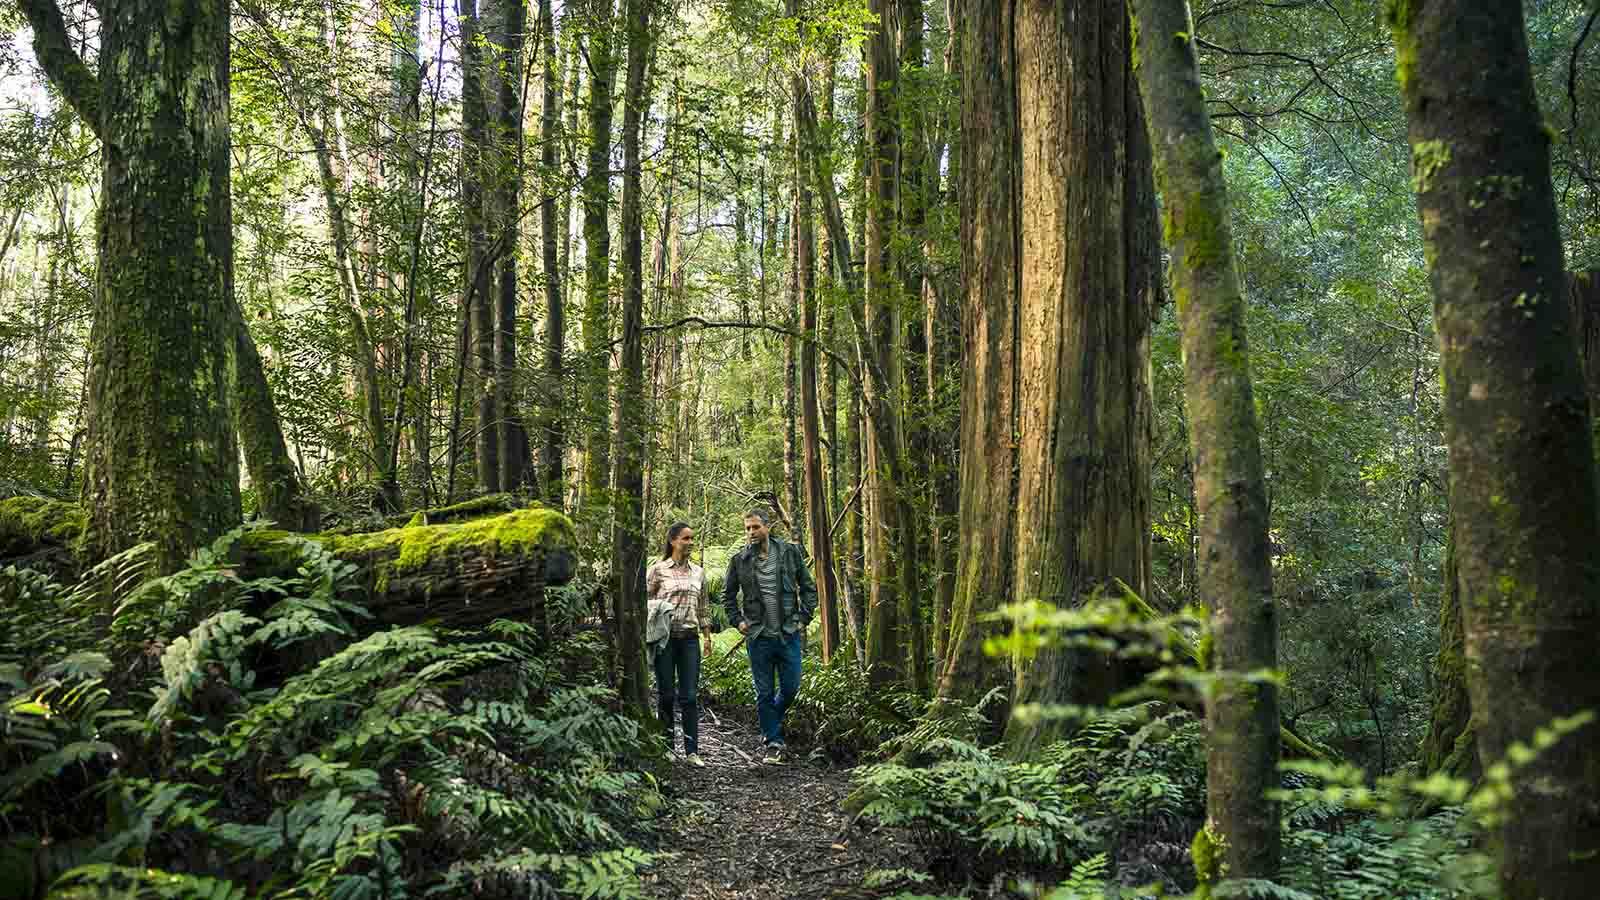 Cumberland Walk, Yarra Valley & Dandenong Ranges, Victoria, Australia